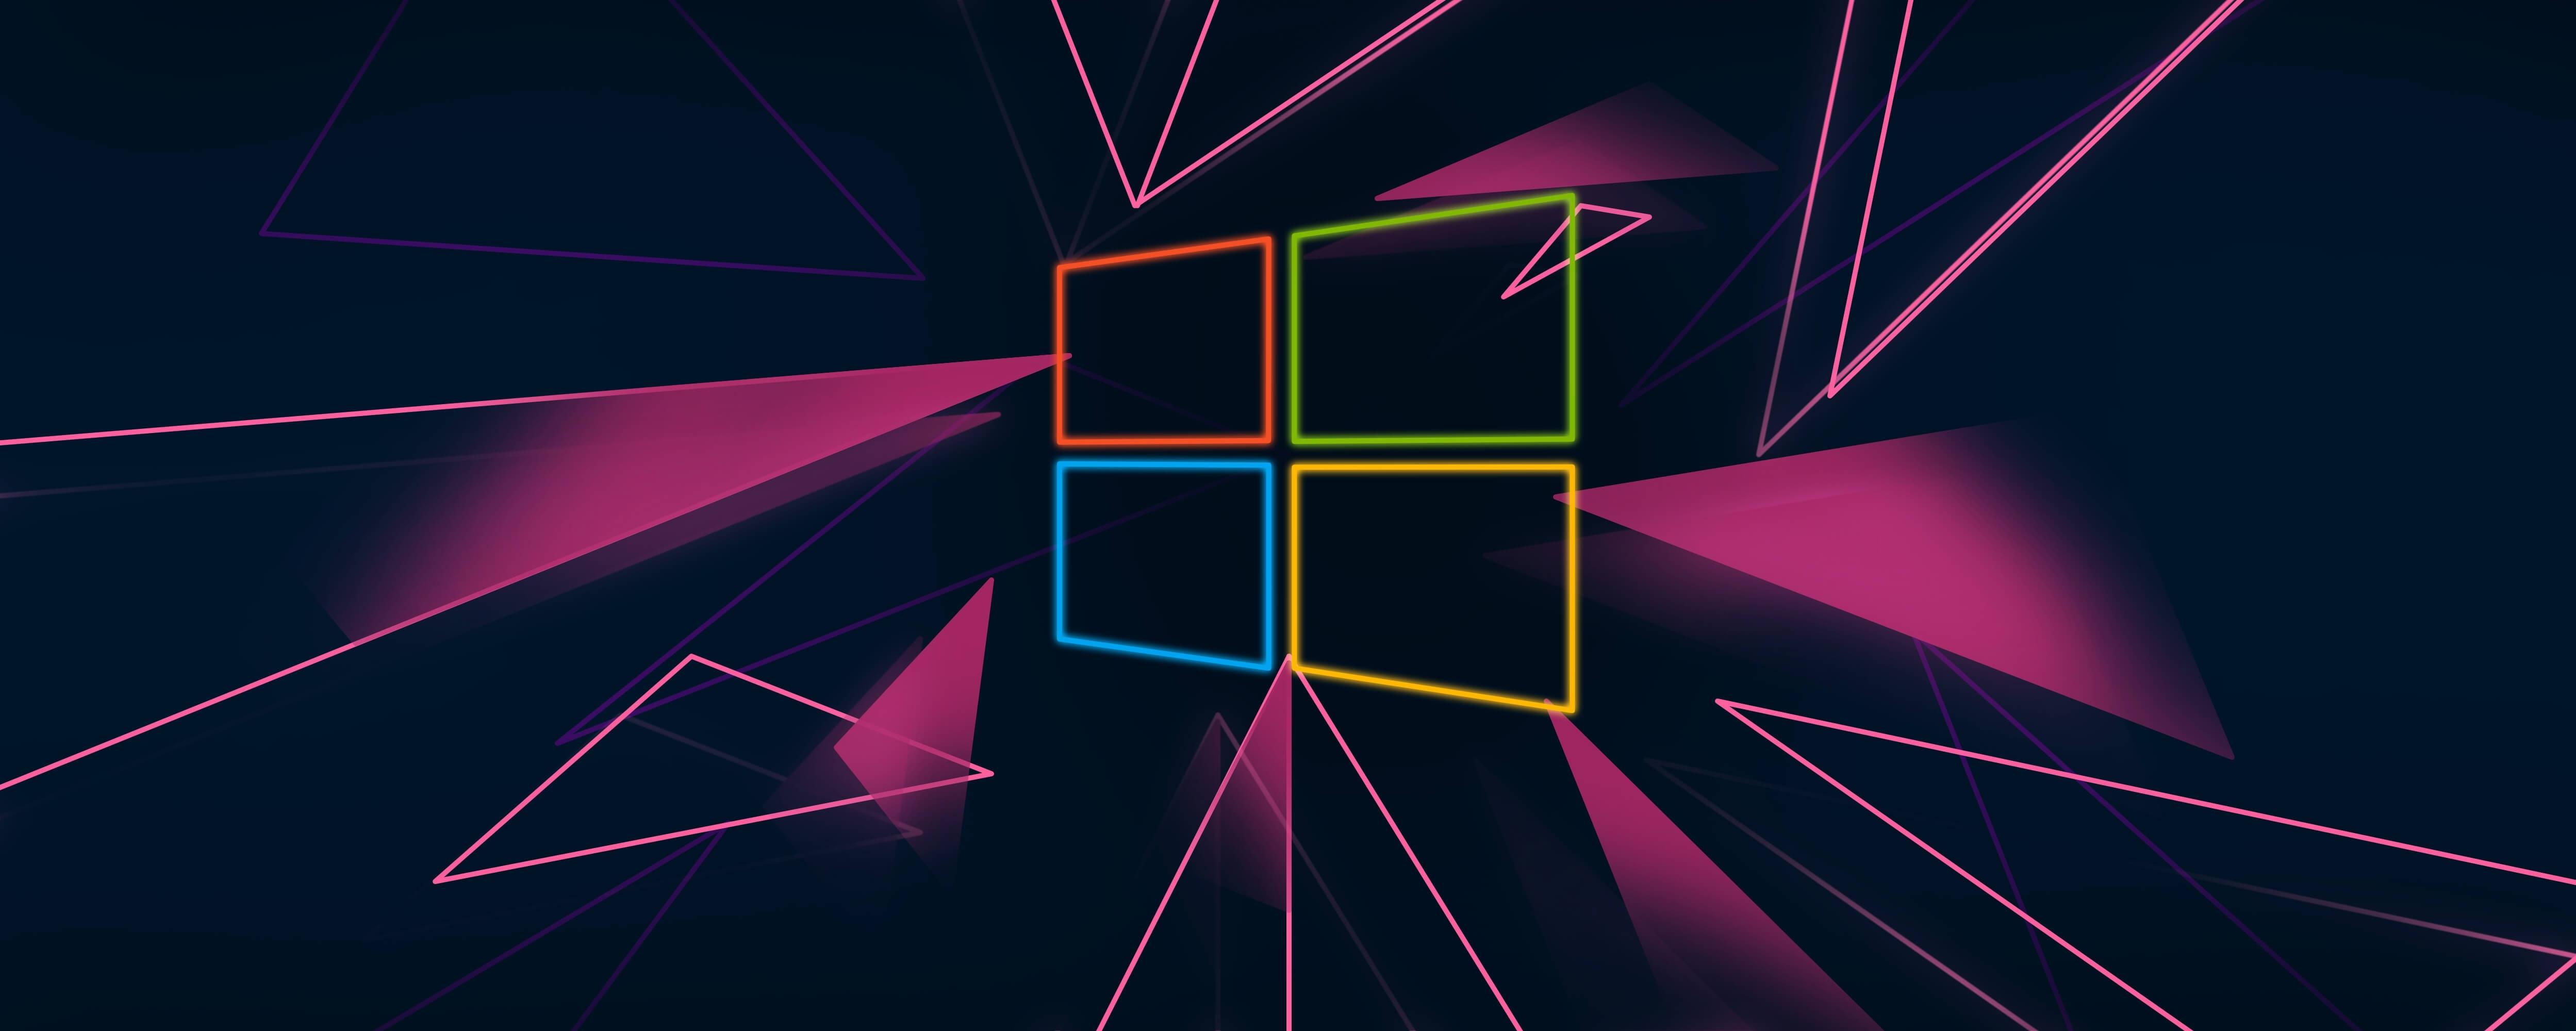 1024x768 Windows 10 Neon Logo 1024x768 Resolution ...